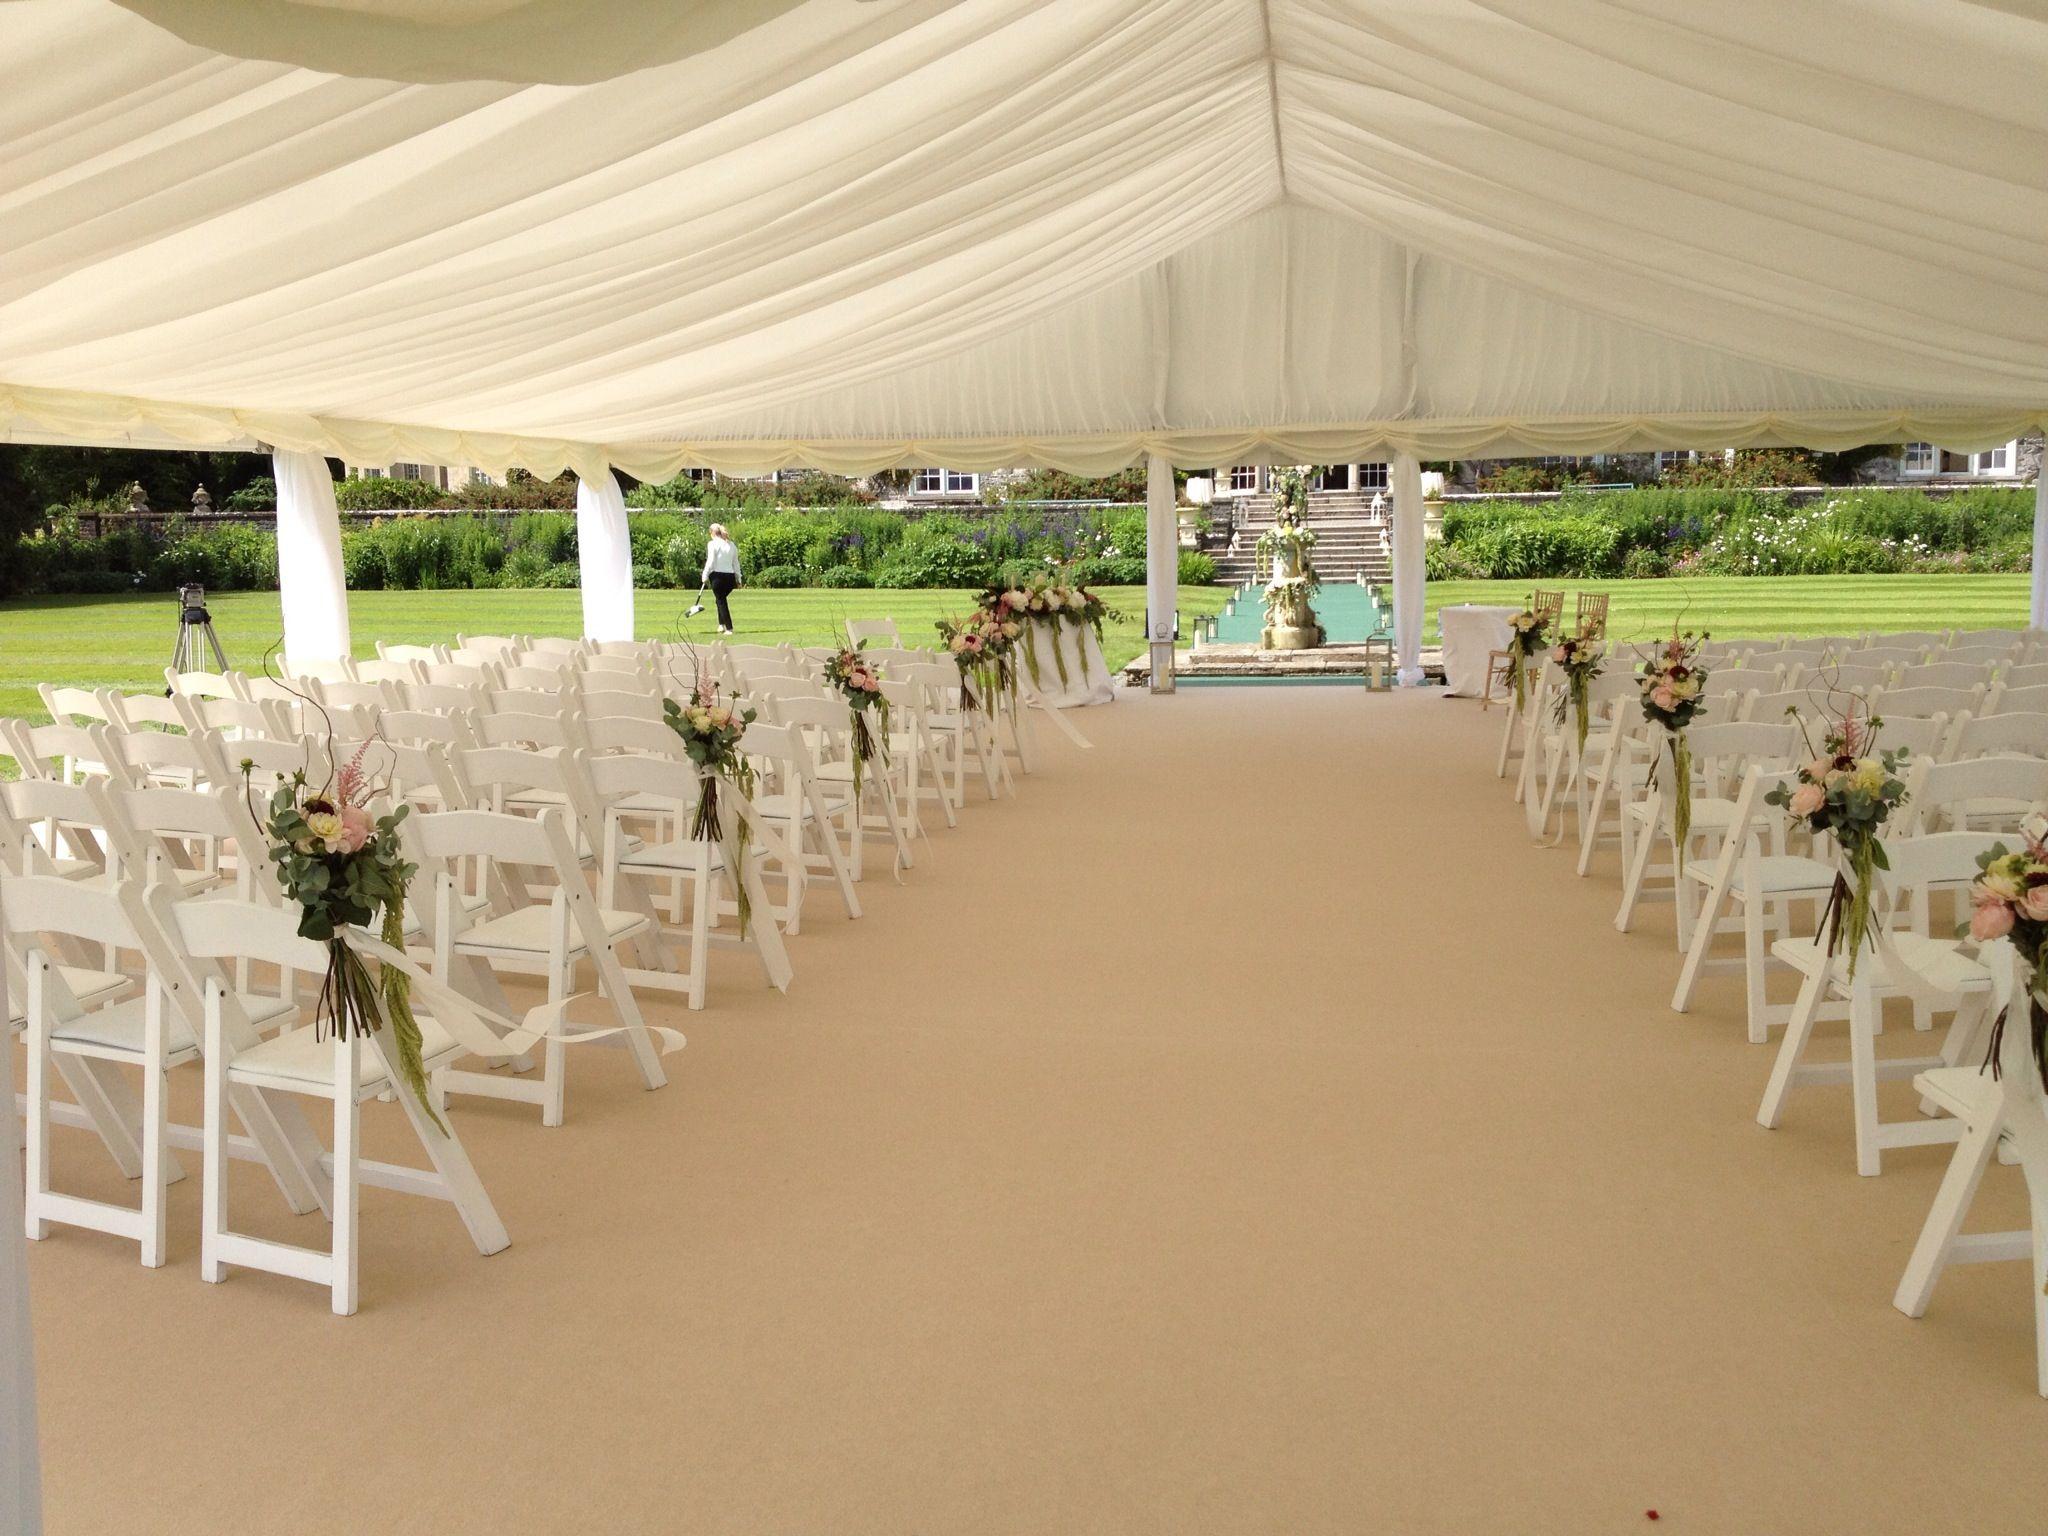 30 best marquee weddings images on pinterest | marquee wedding